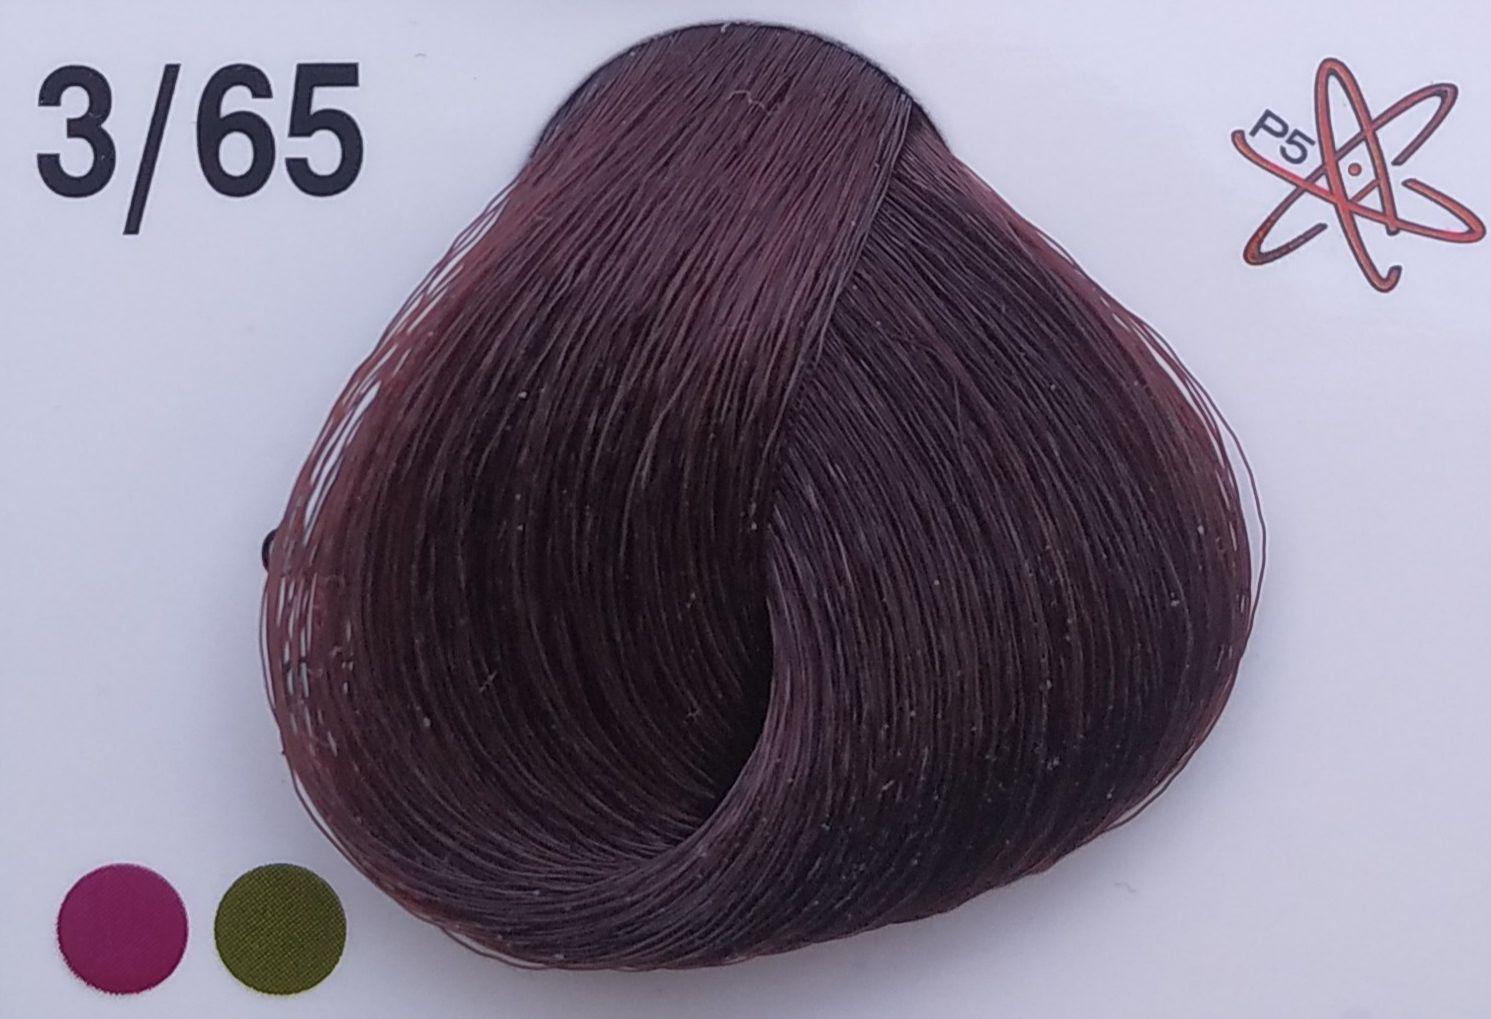 Barva na vlasy Subrina professional Unique 3/65 - tmavě hnědá mahagonová